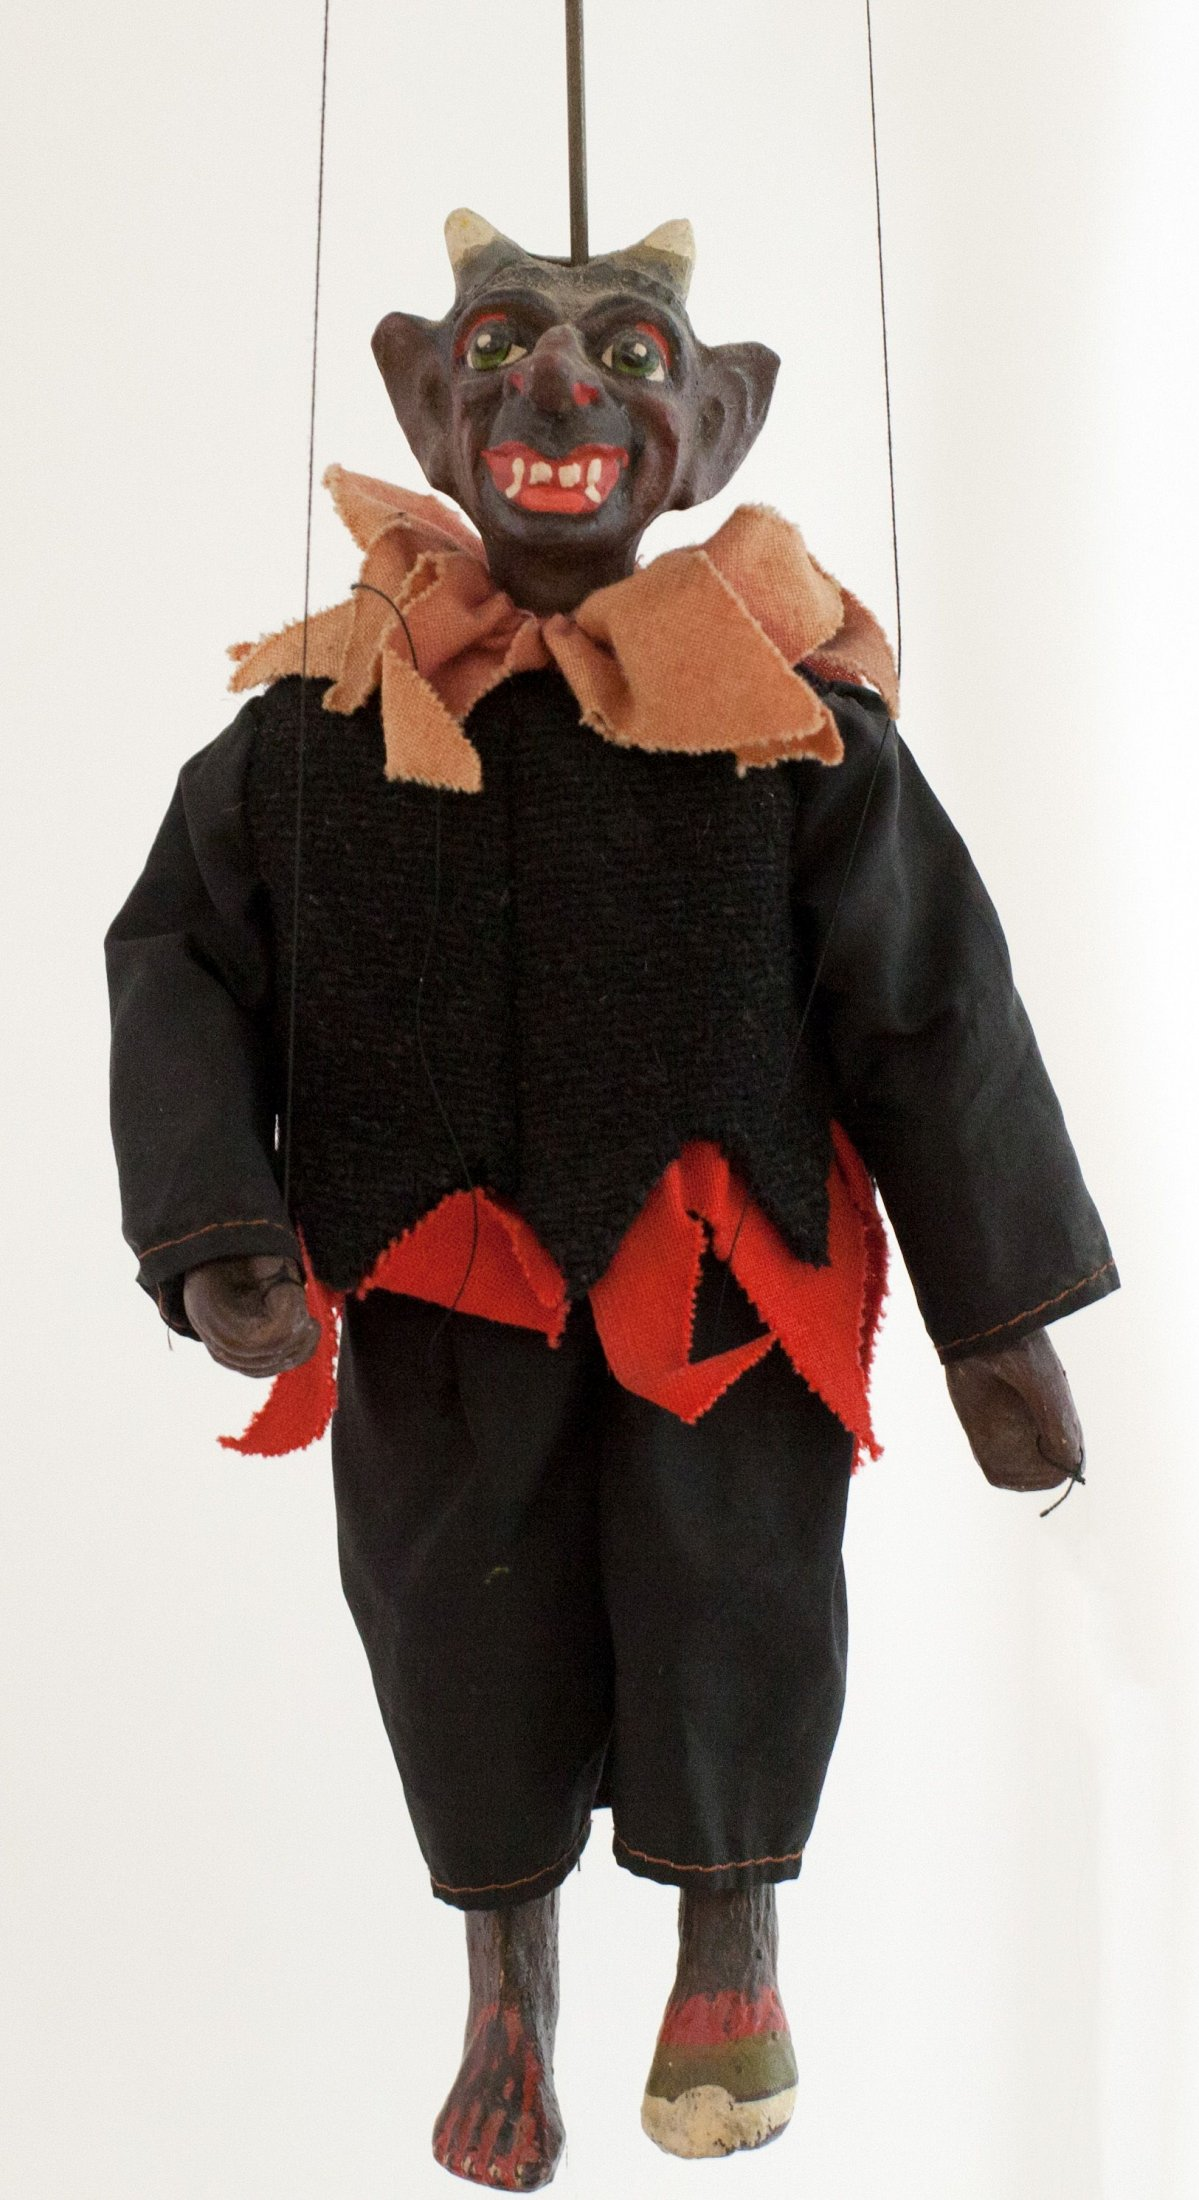 Teufel, Marionette